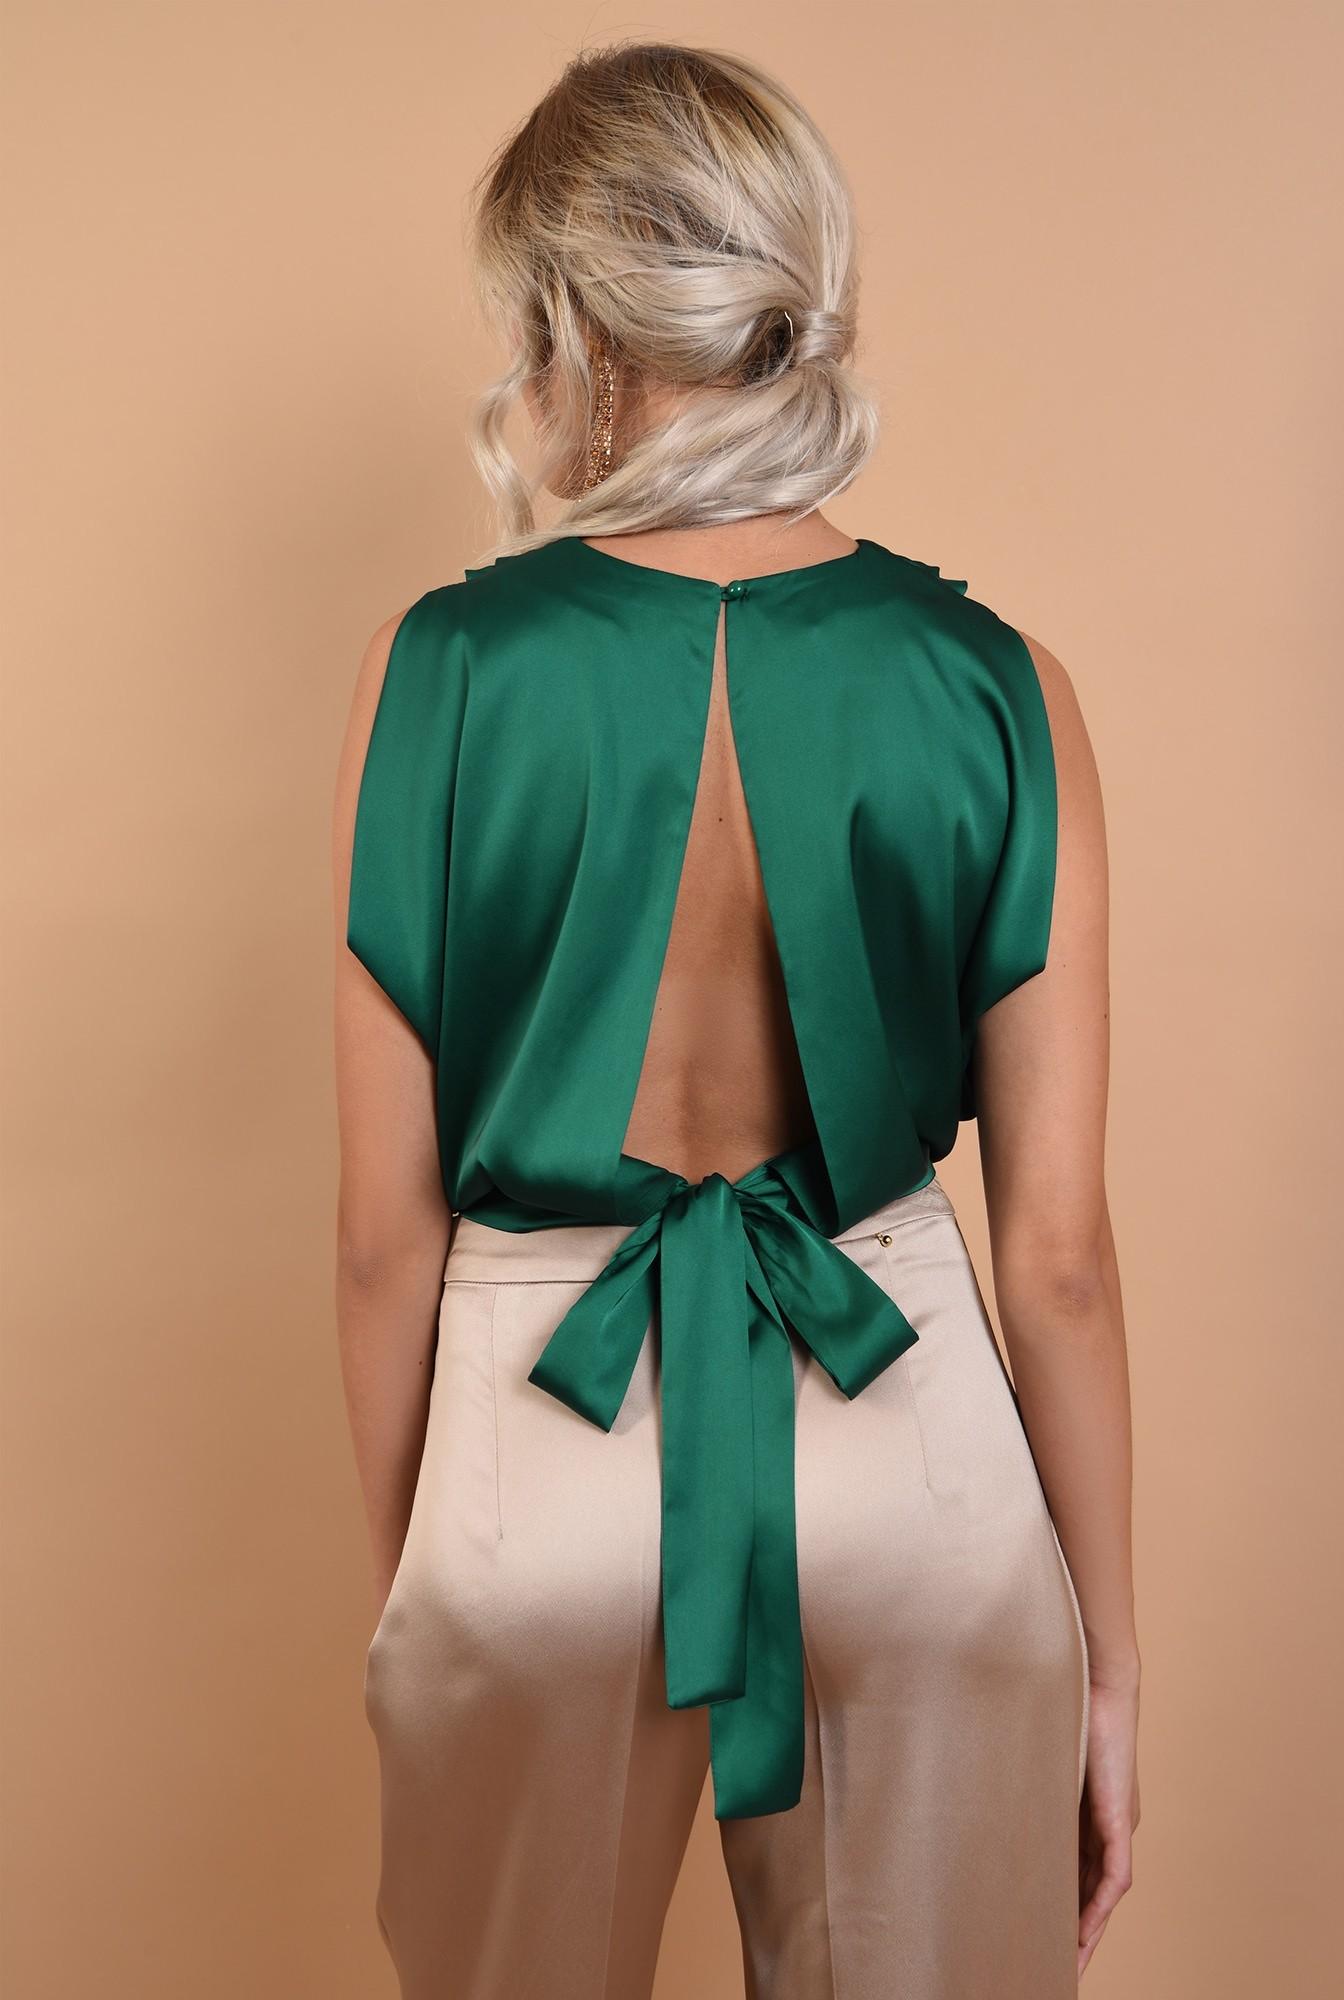 1 - bluza de seara, cu umeri fronsati, cu funda la spate, Poema, verde